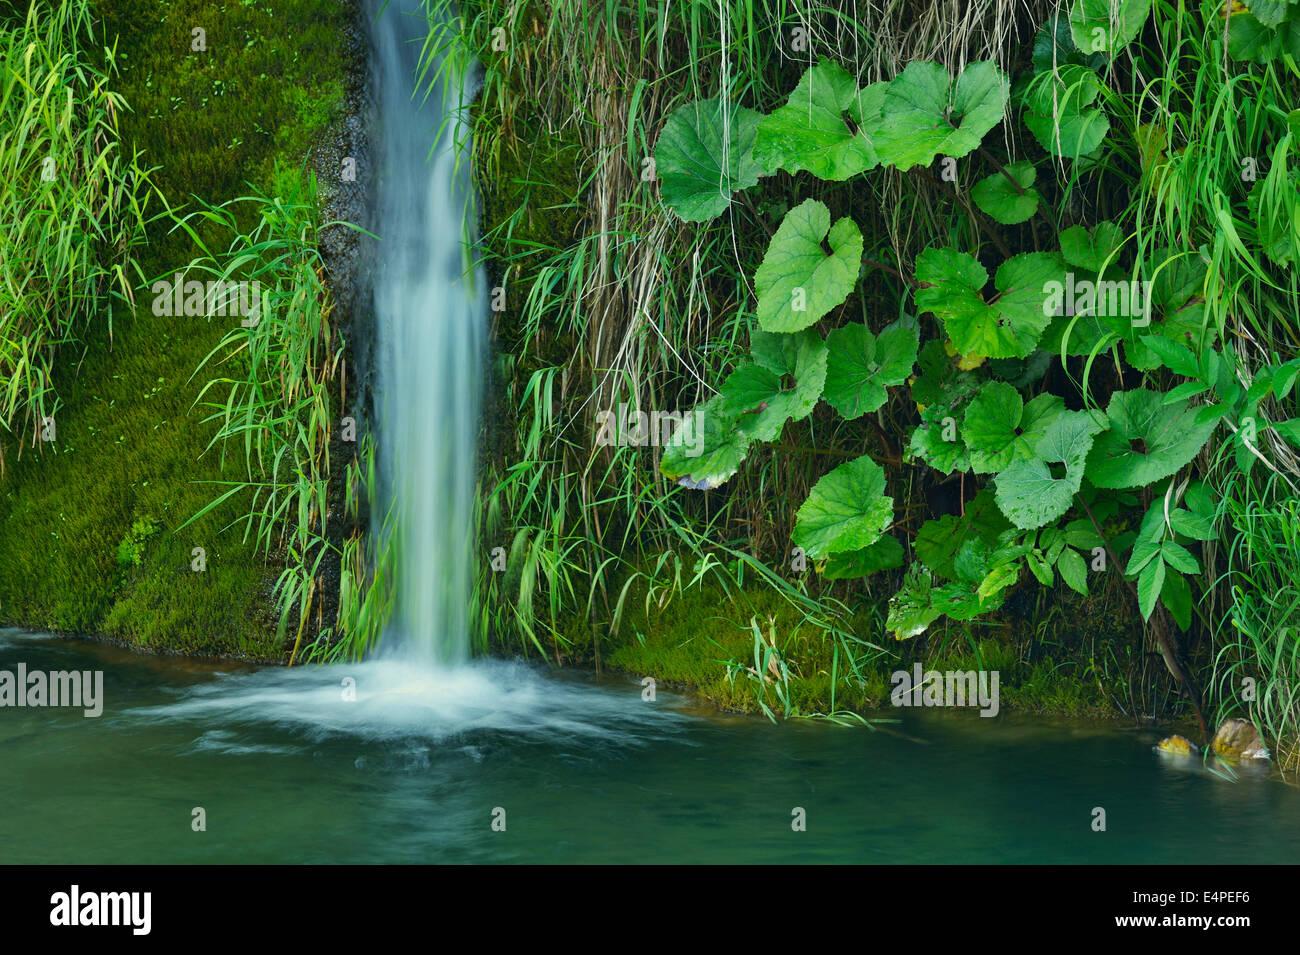 Waterfall, Plitvice Lakes National Park, Plitvice Jezera, Lika-Senj, Croatia - Stock Image